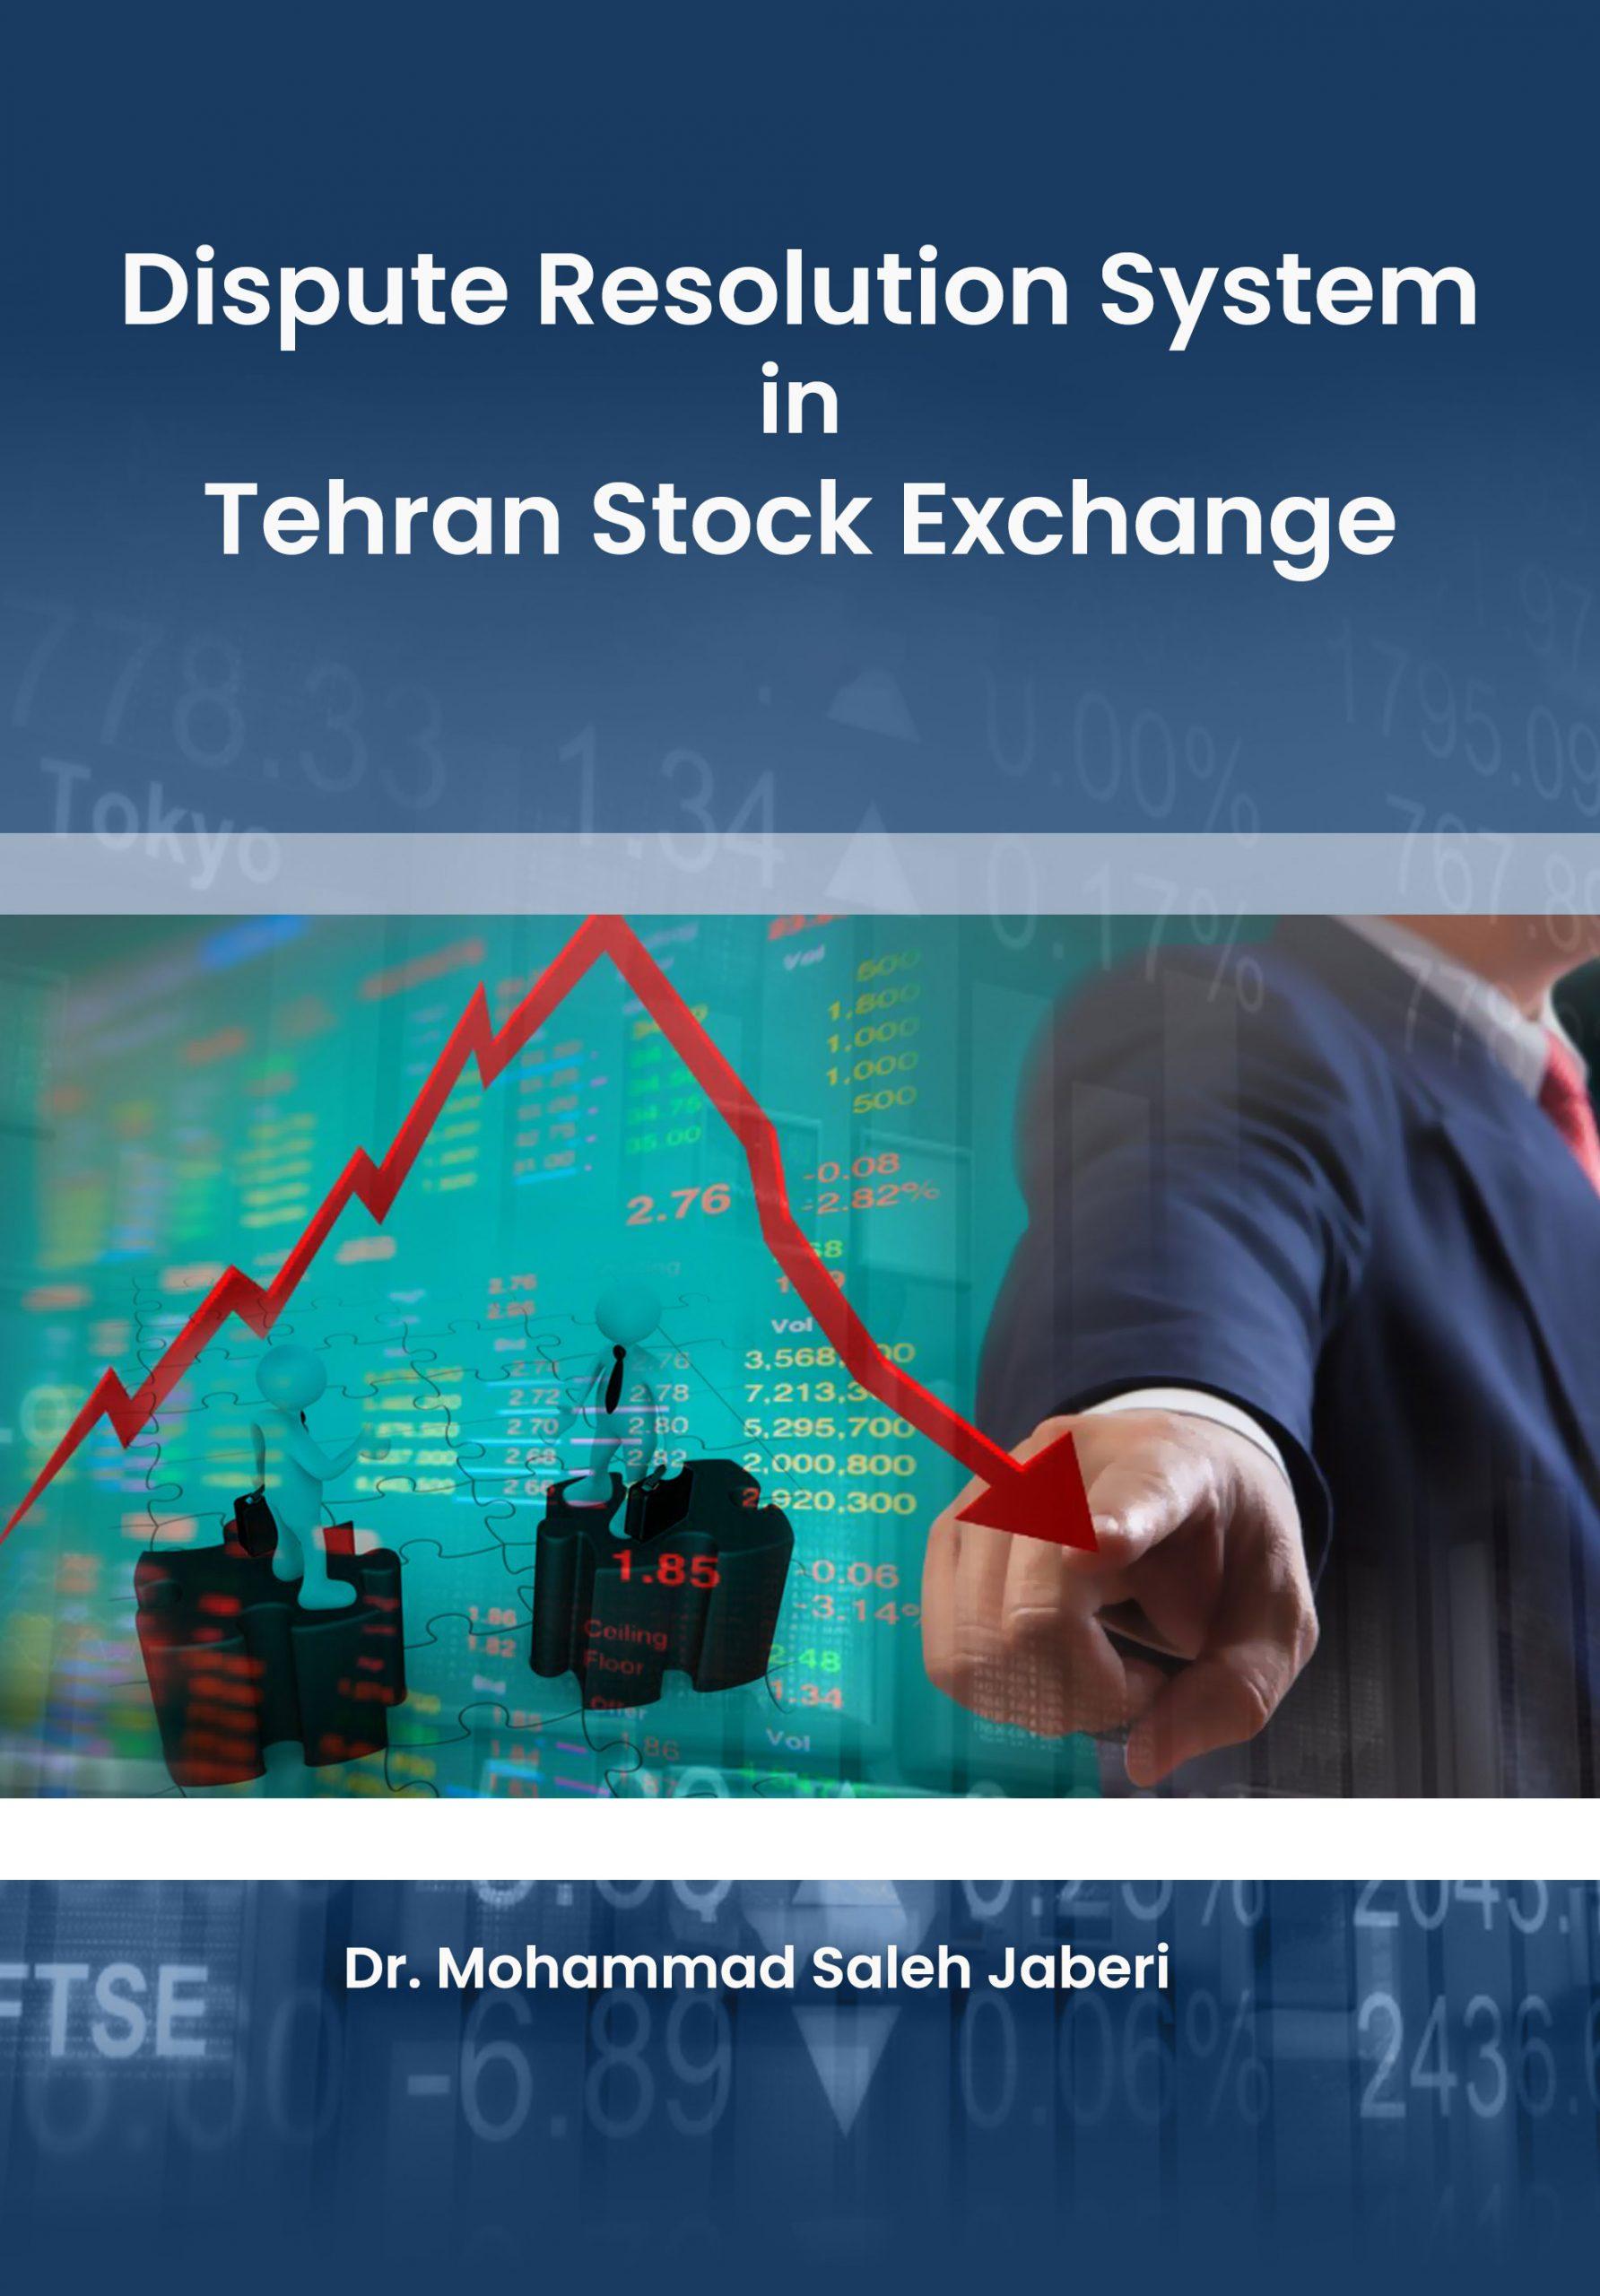 Dispute Resolution System in Tehran Stock Exchange